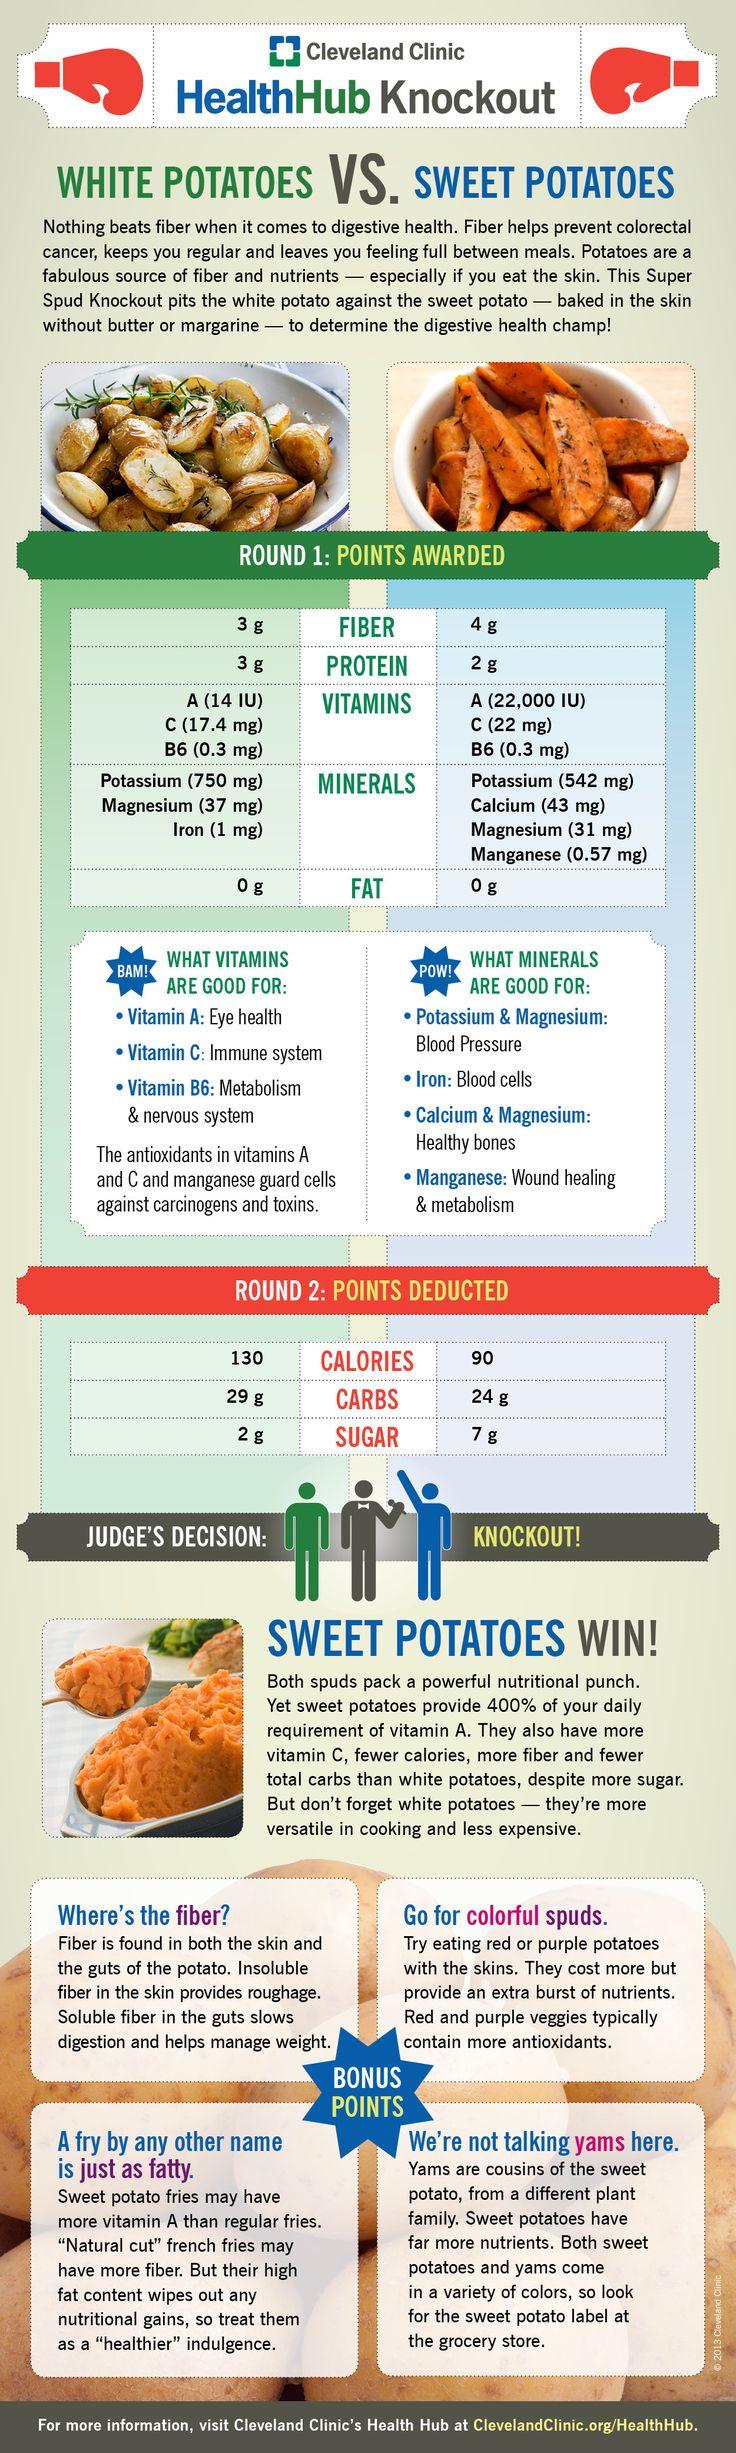 Health Hub Knockout White Potatoes vs. Sweet Potatoes final